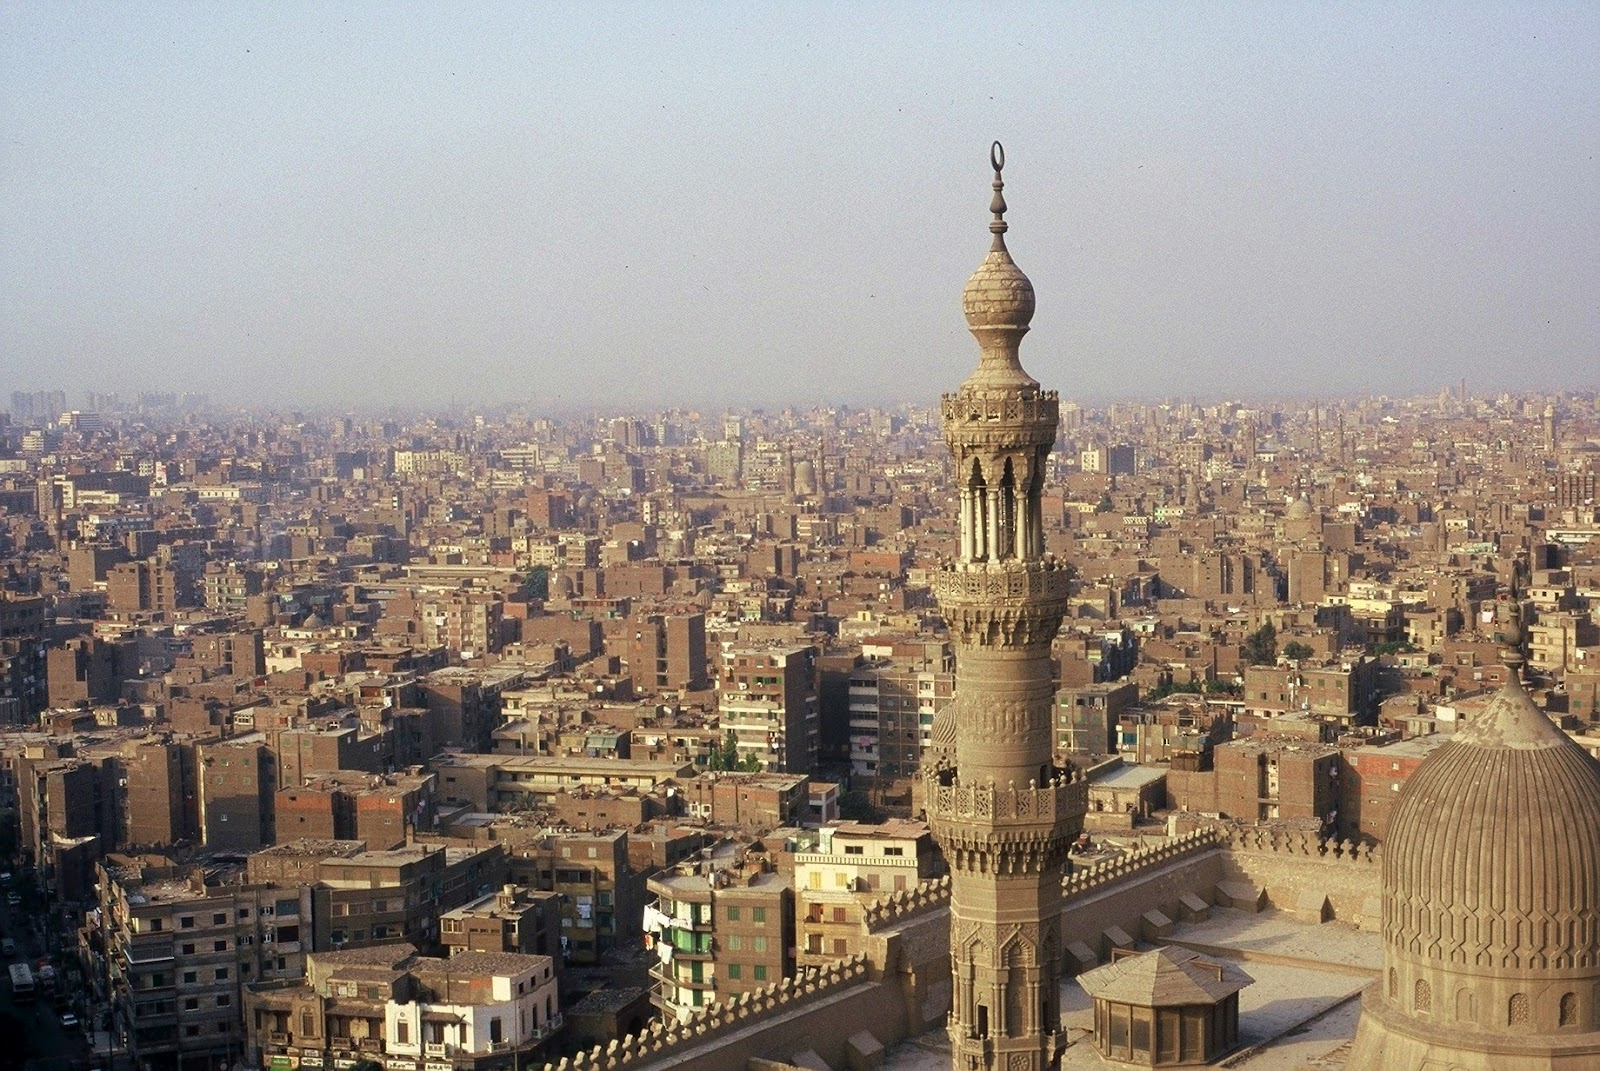 GLOBE IN THE BLOG: Cairo, Egypt